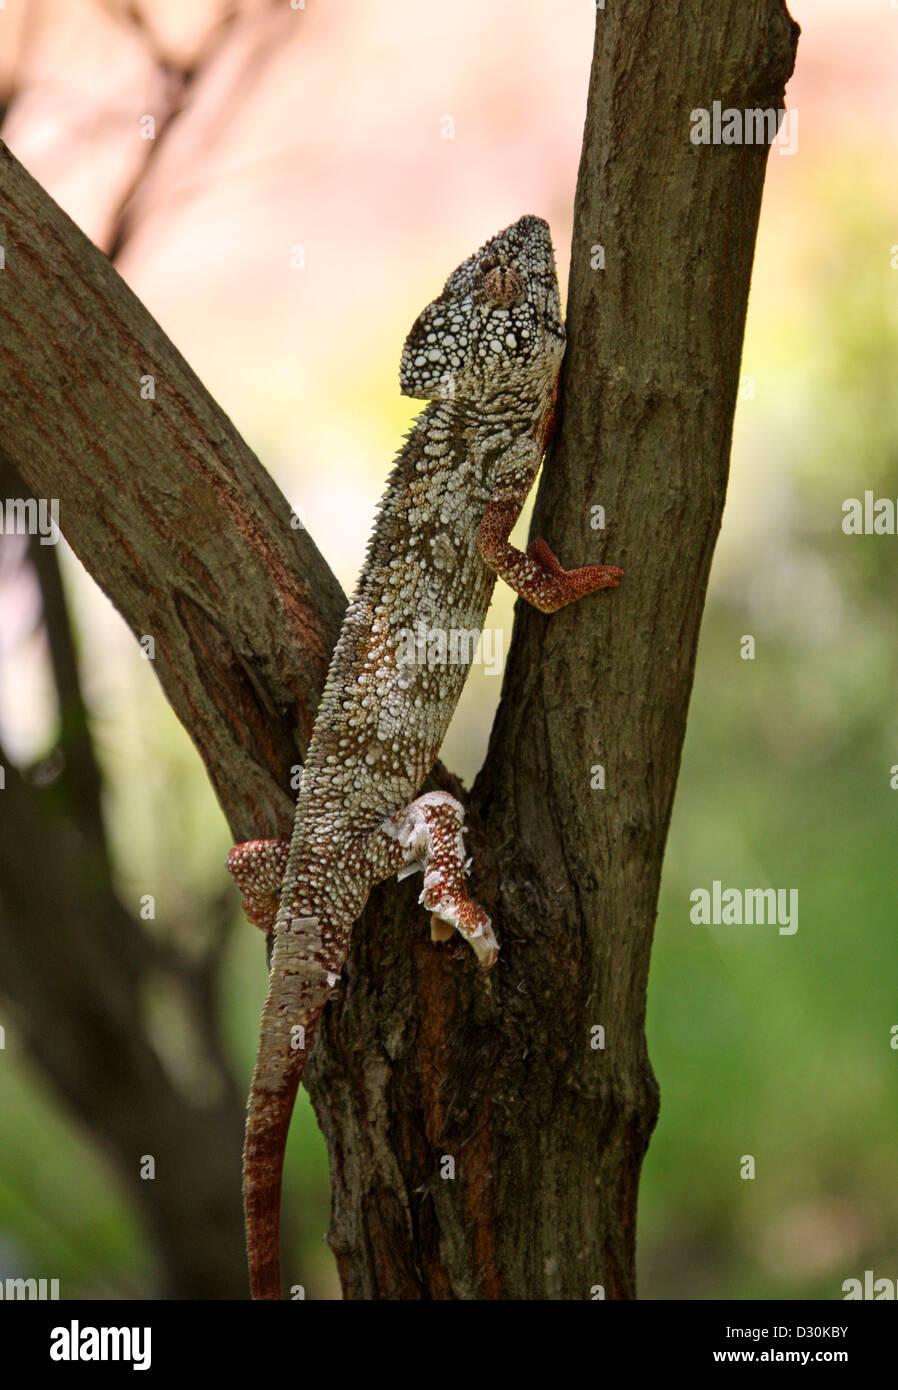 Die Oustalet oder madagassische riesige Chamäleon Furcifer Oustaleti, Chamaeleonidae, Squamata. Madagaskar, Stockbild